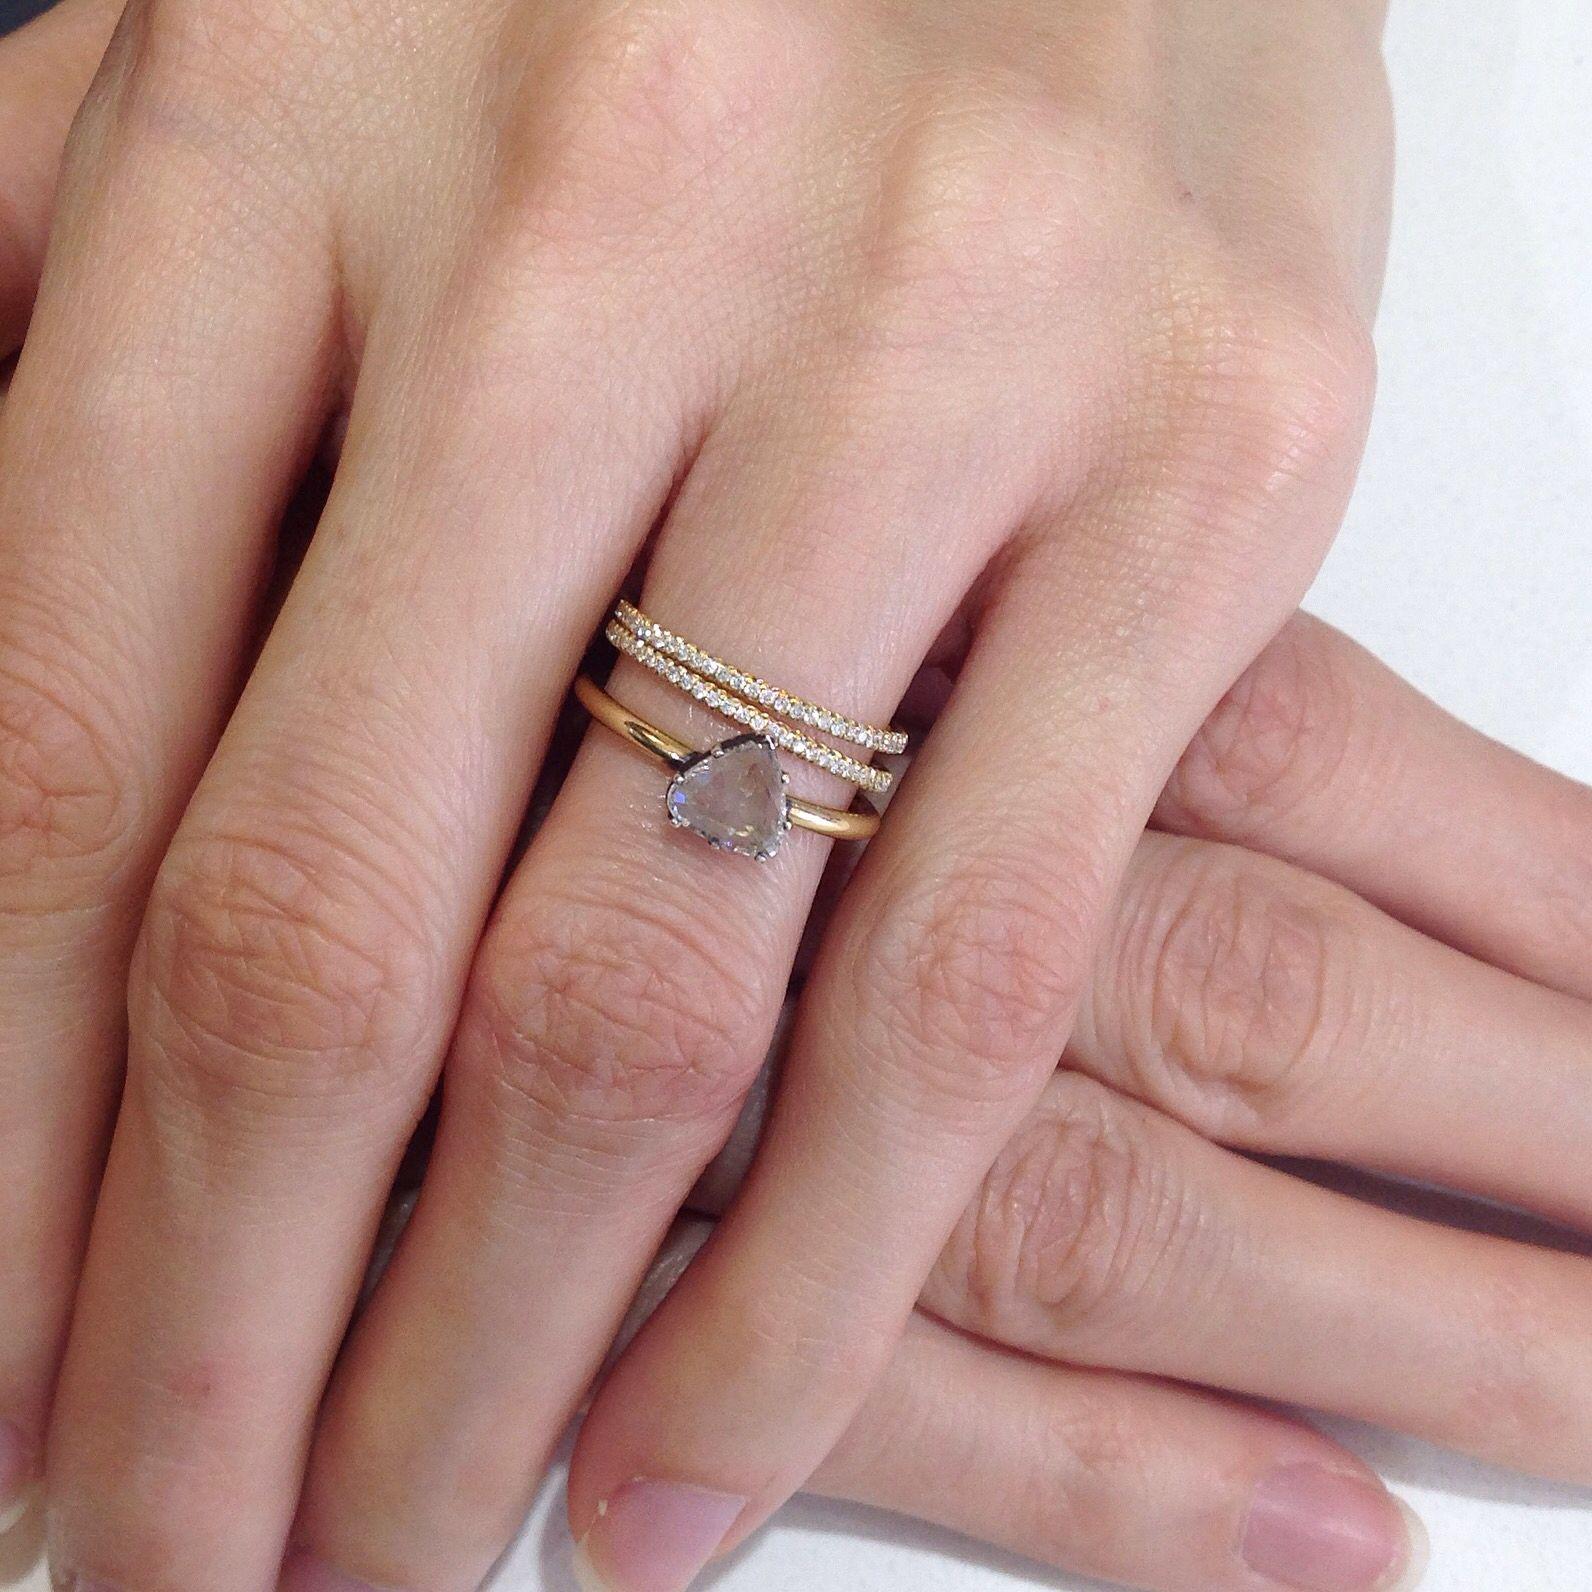 Pin by madi lake on chic diamond engagement ring | Pinterest ...